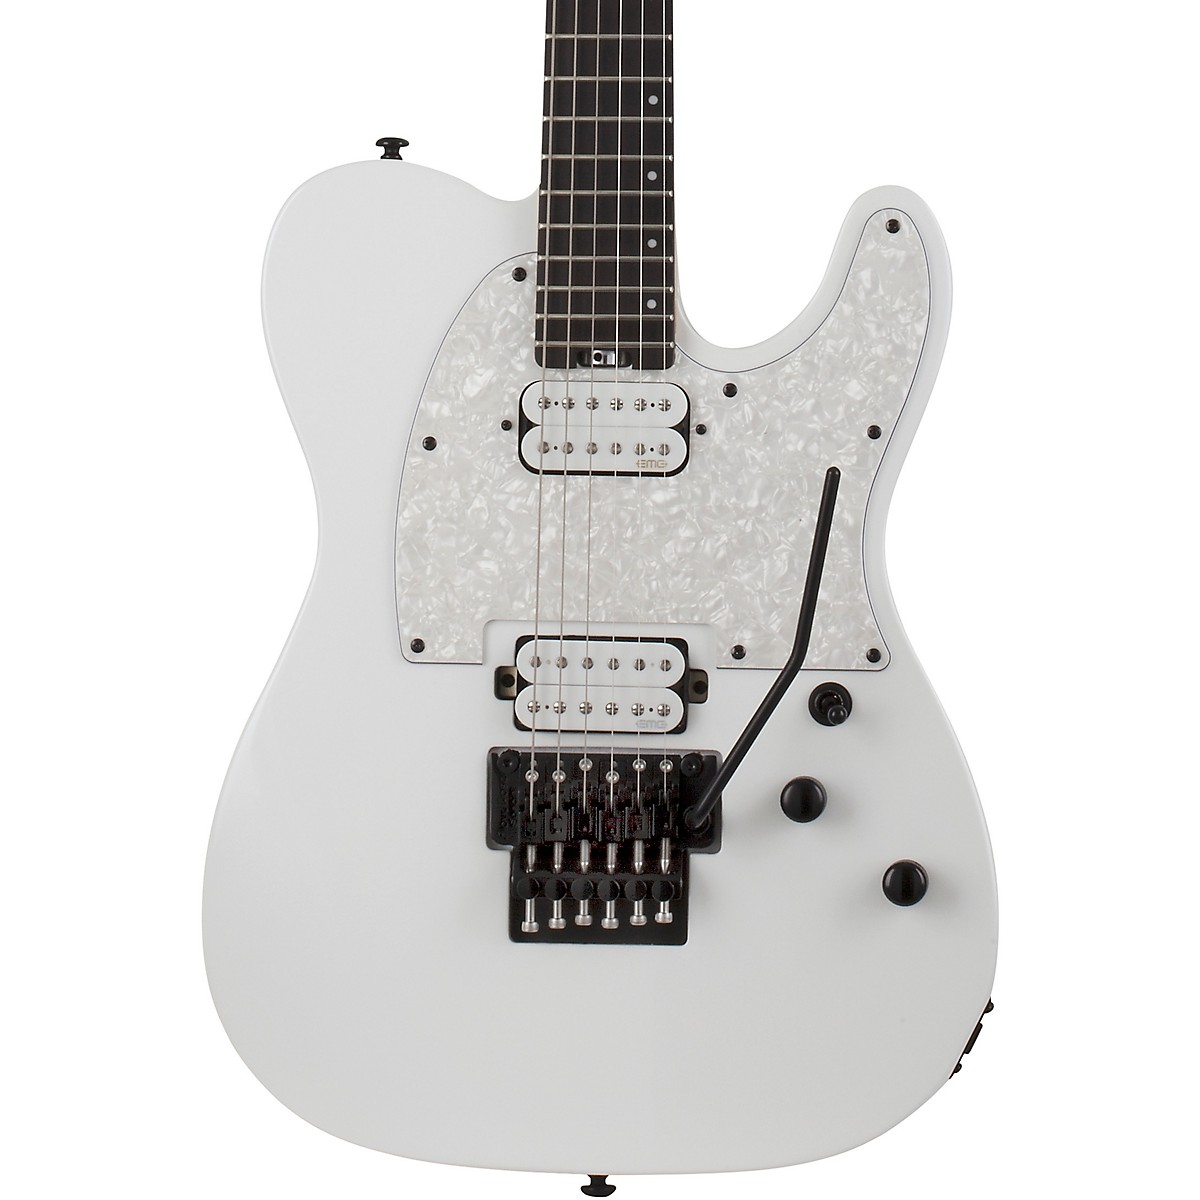 Schecter Guitar Research SVSS PT-FR Rosewood Fingerboard Electric Guitar